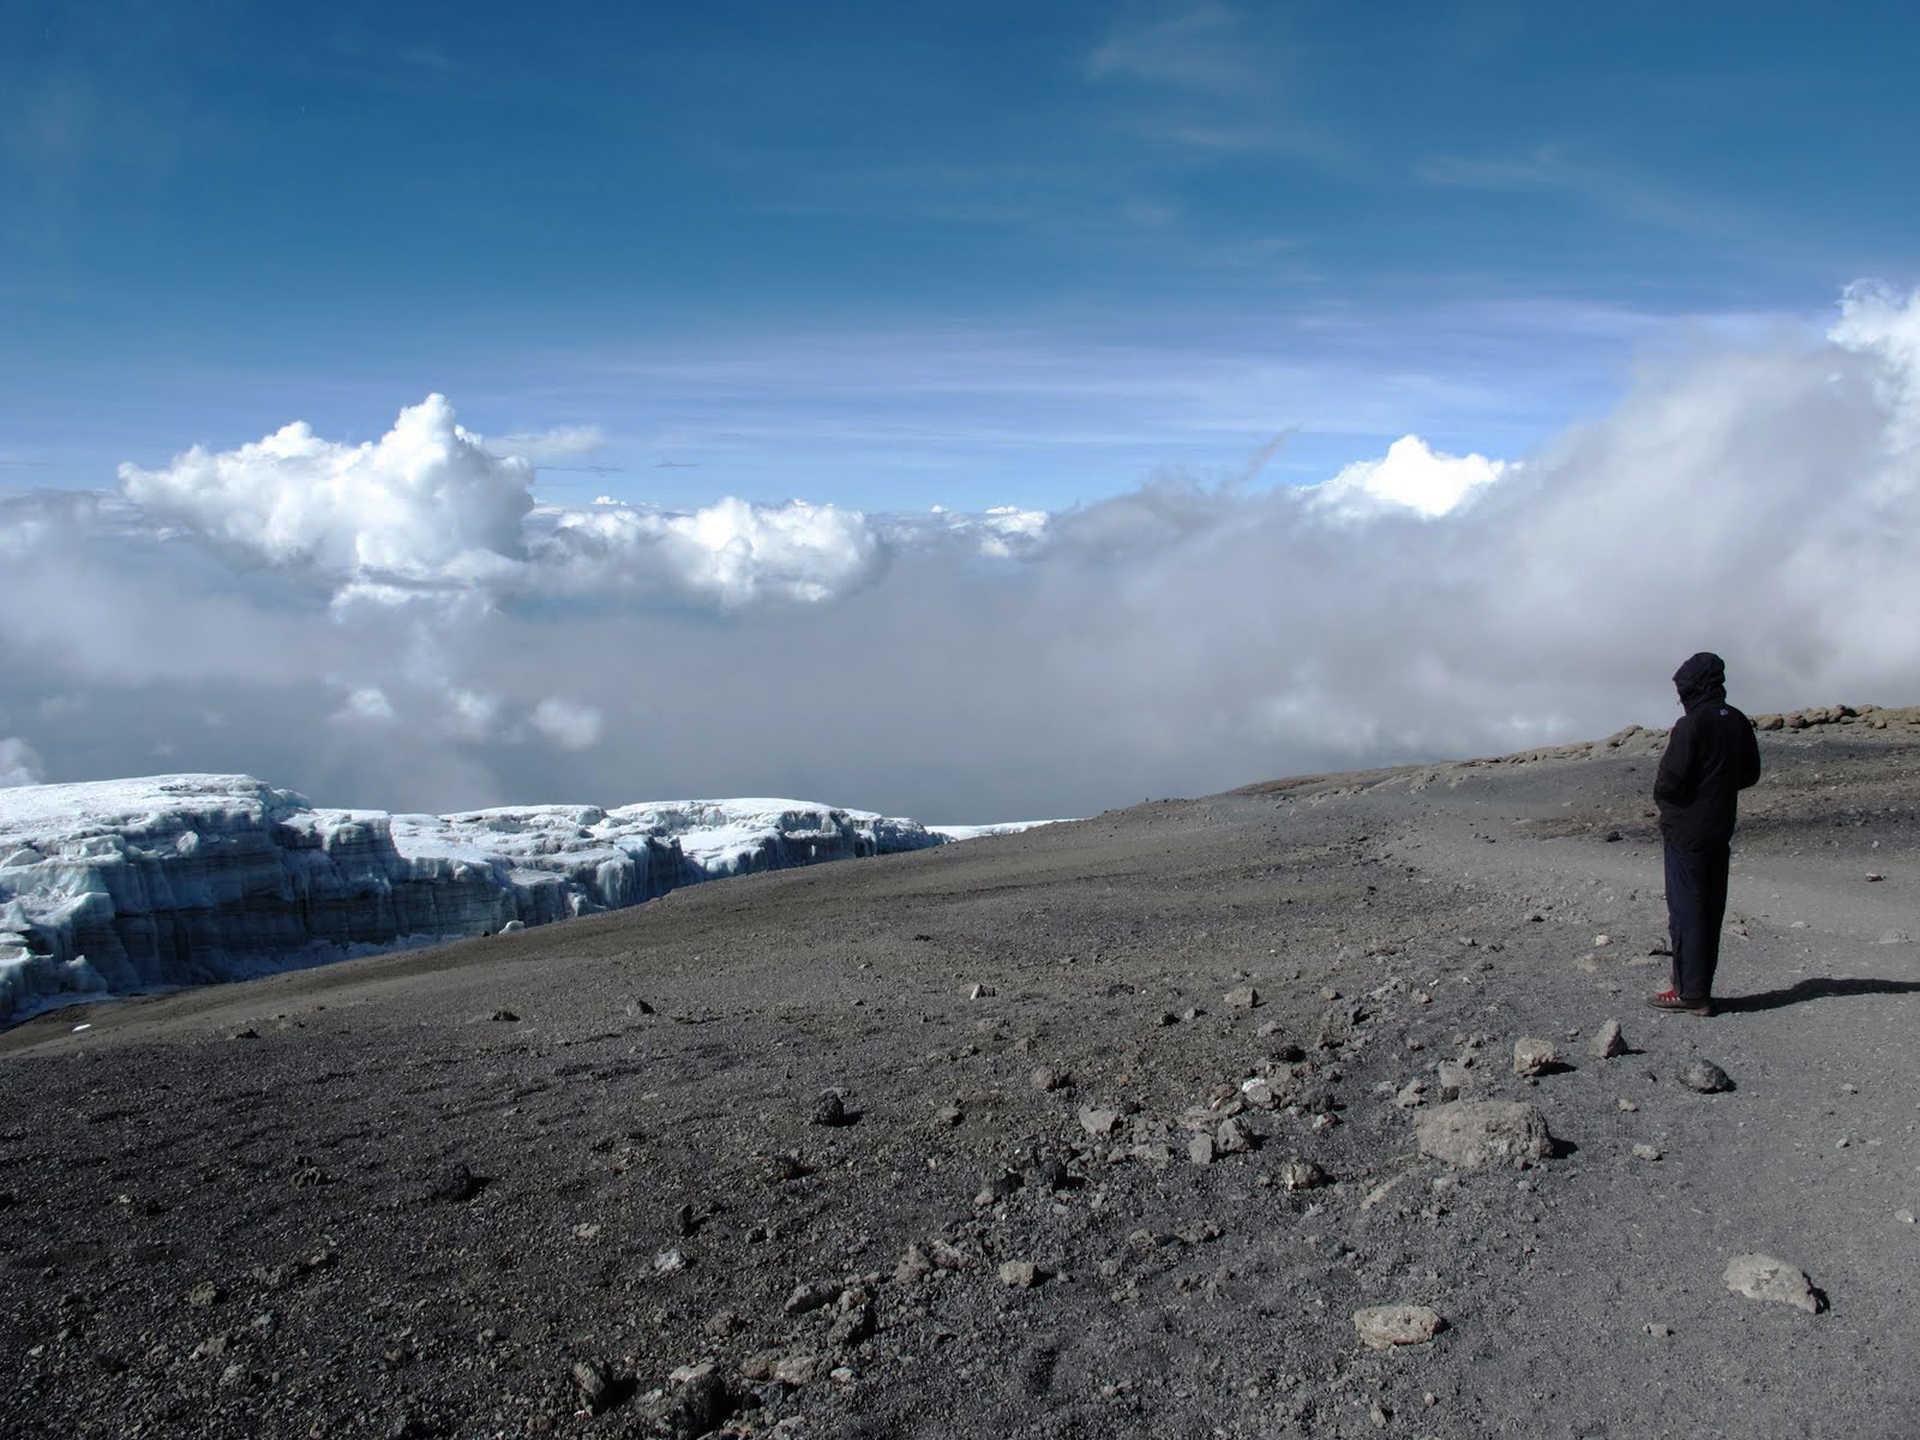 Hiker on the summit of Kilimanjaro